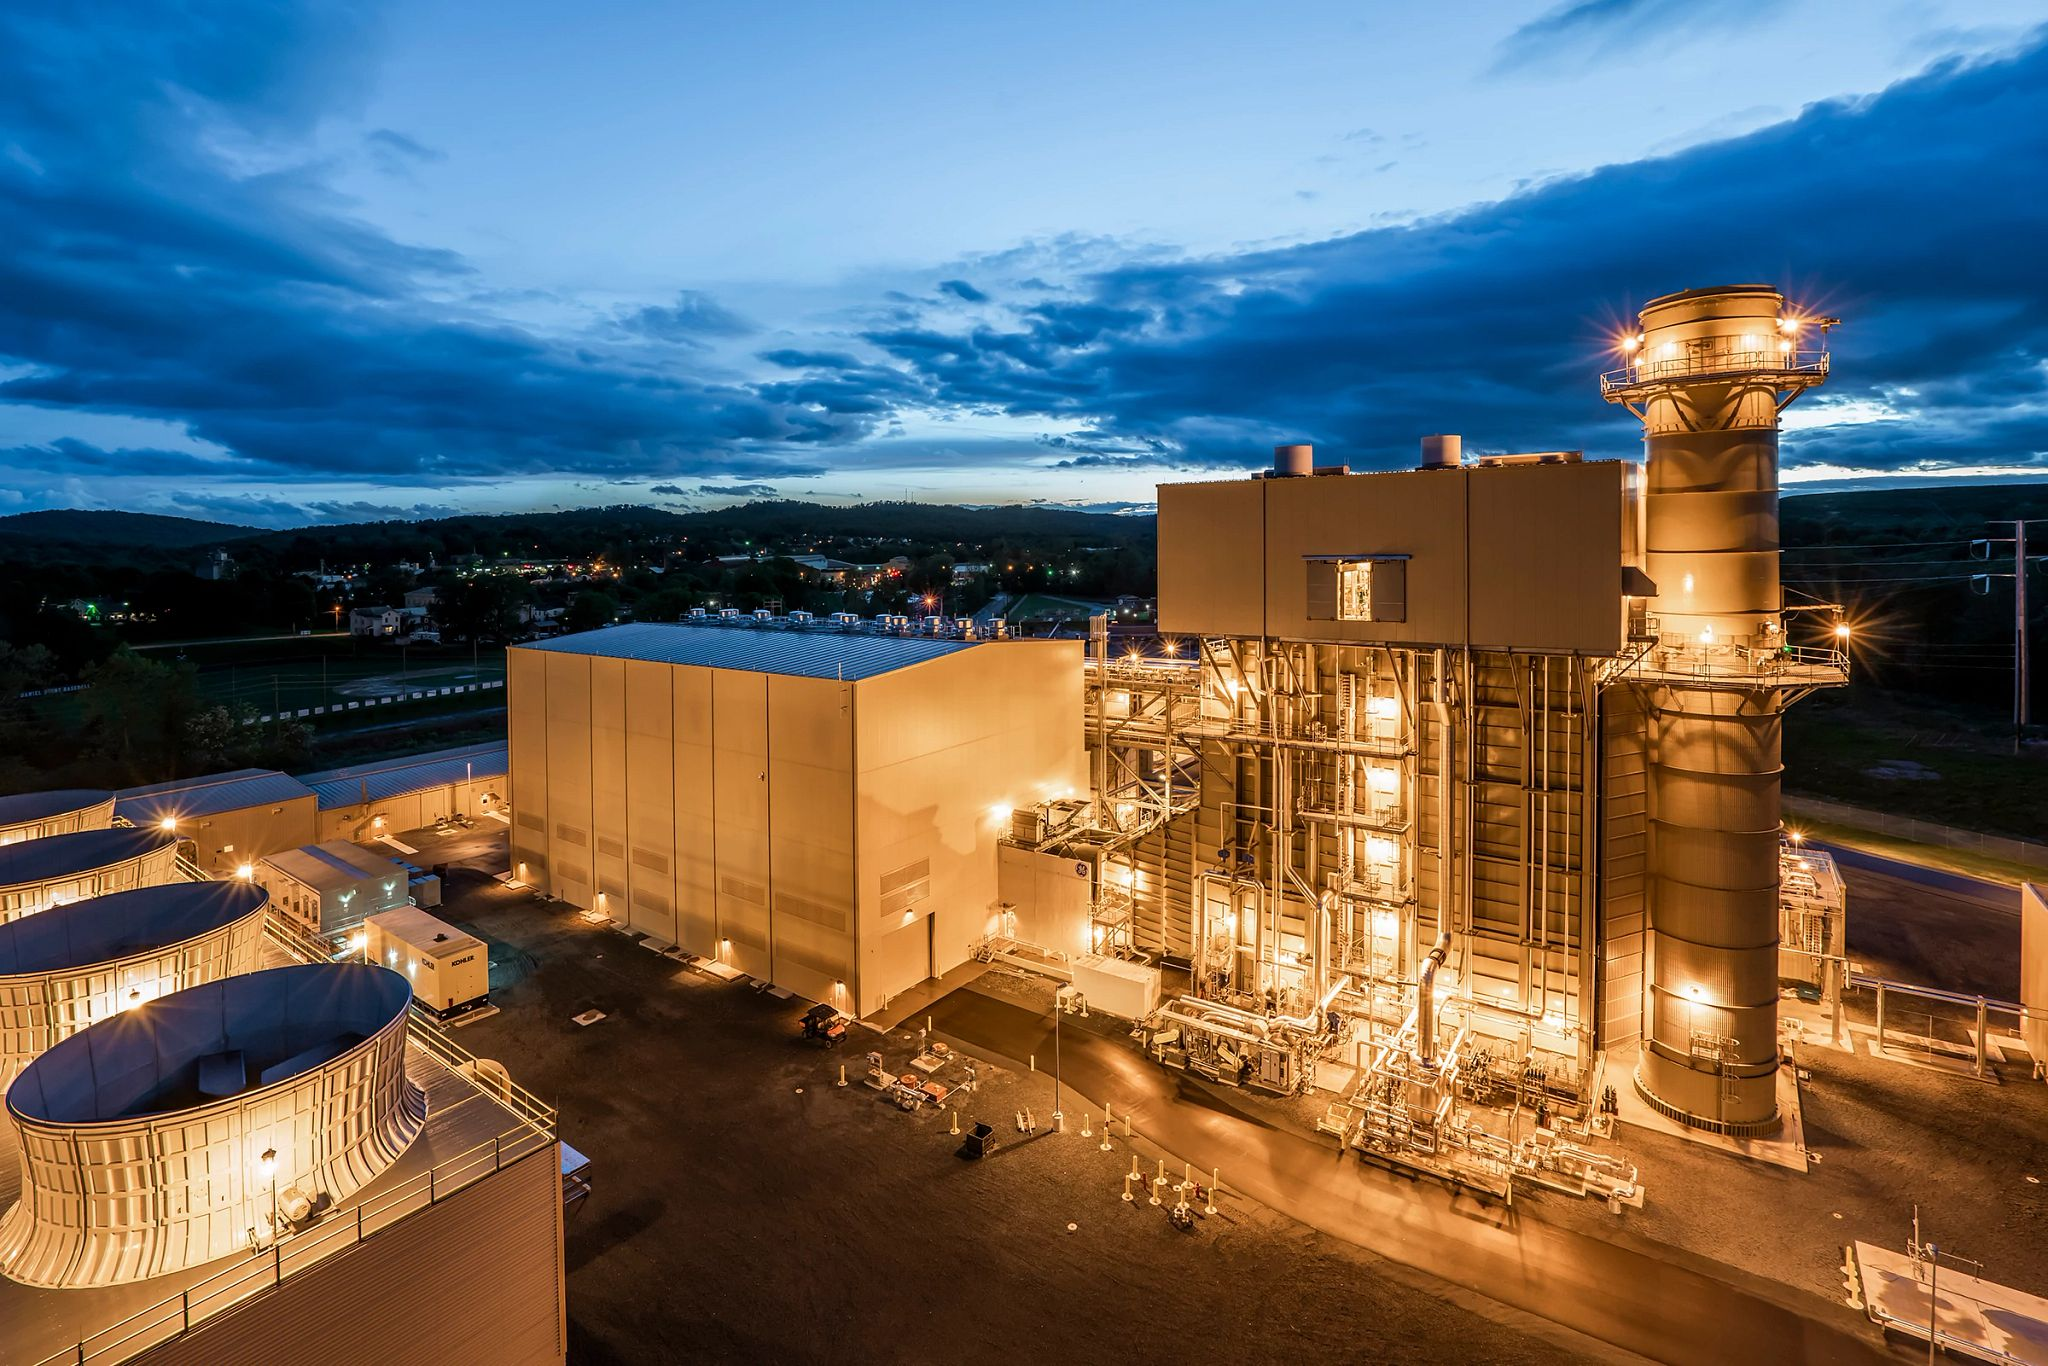 Birdsboro Power Plant